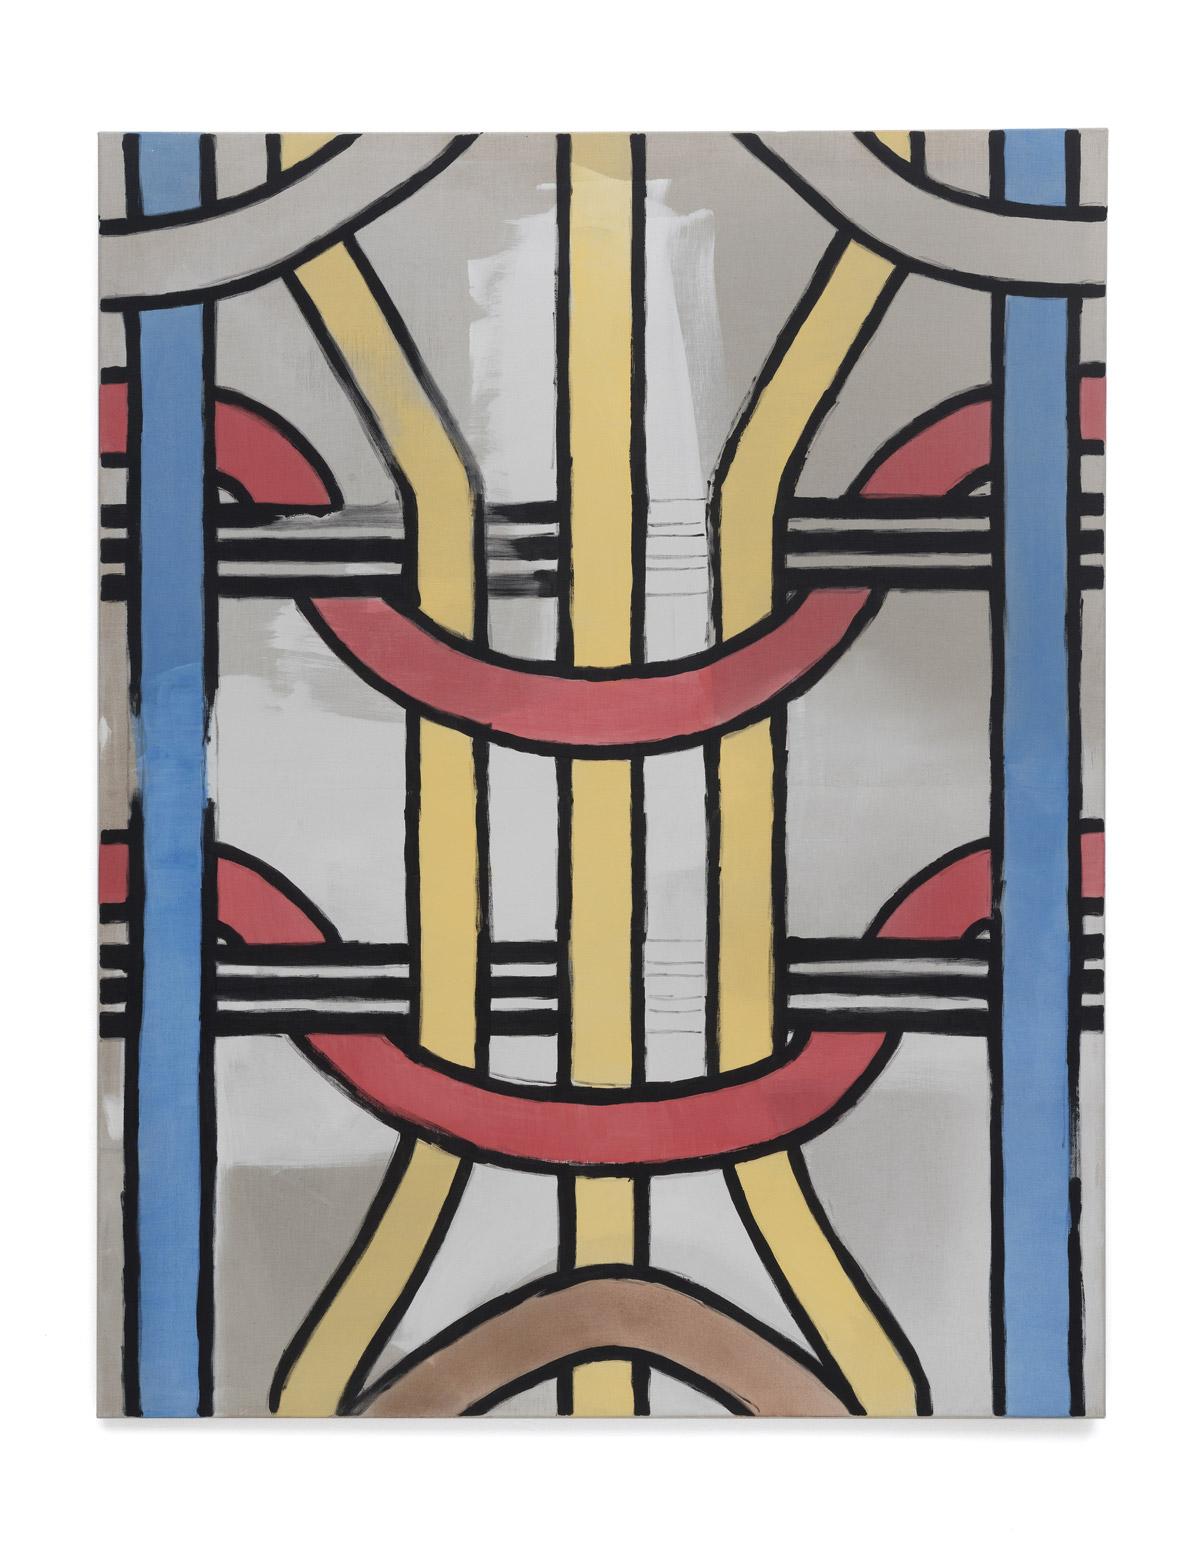 Martin Feldbauer Underdog III 2018 acrylic on linen 185x145 cm